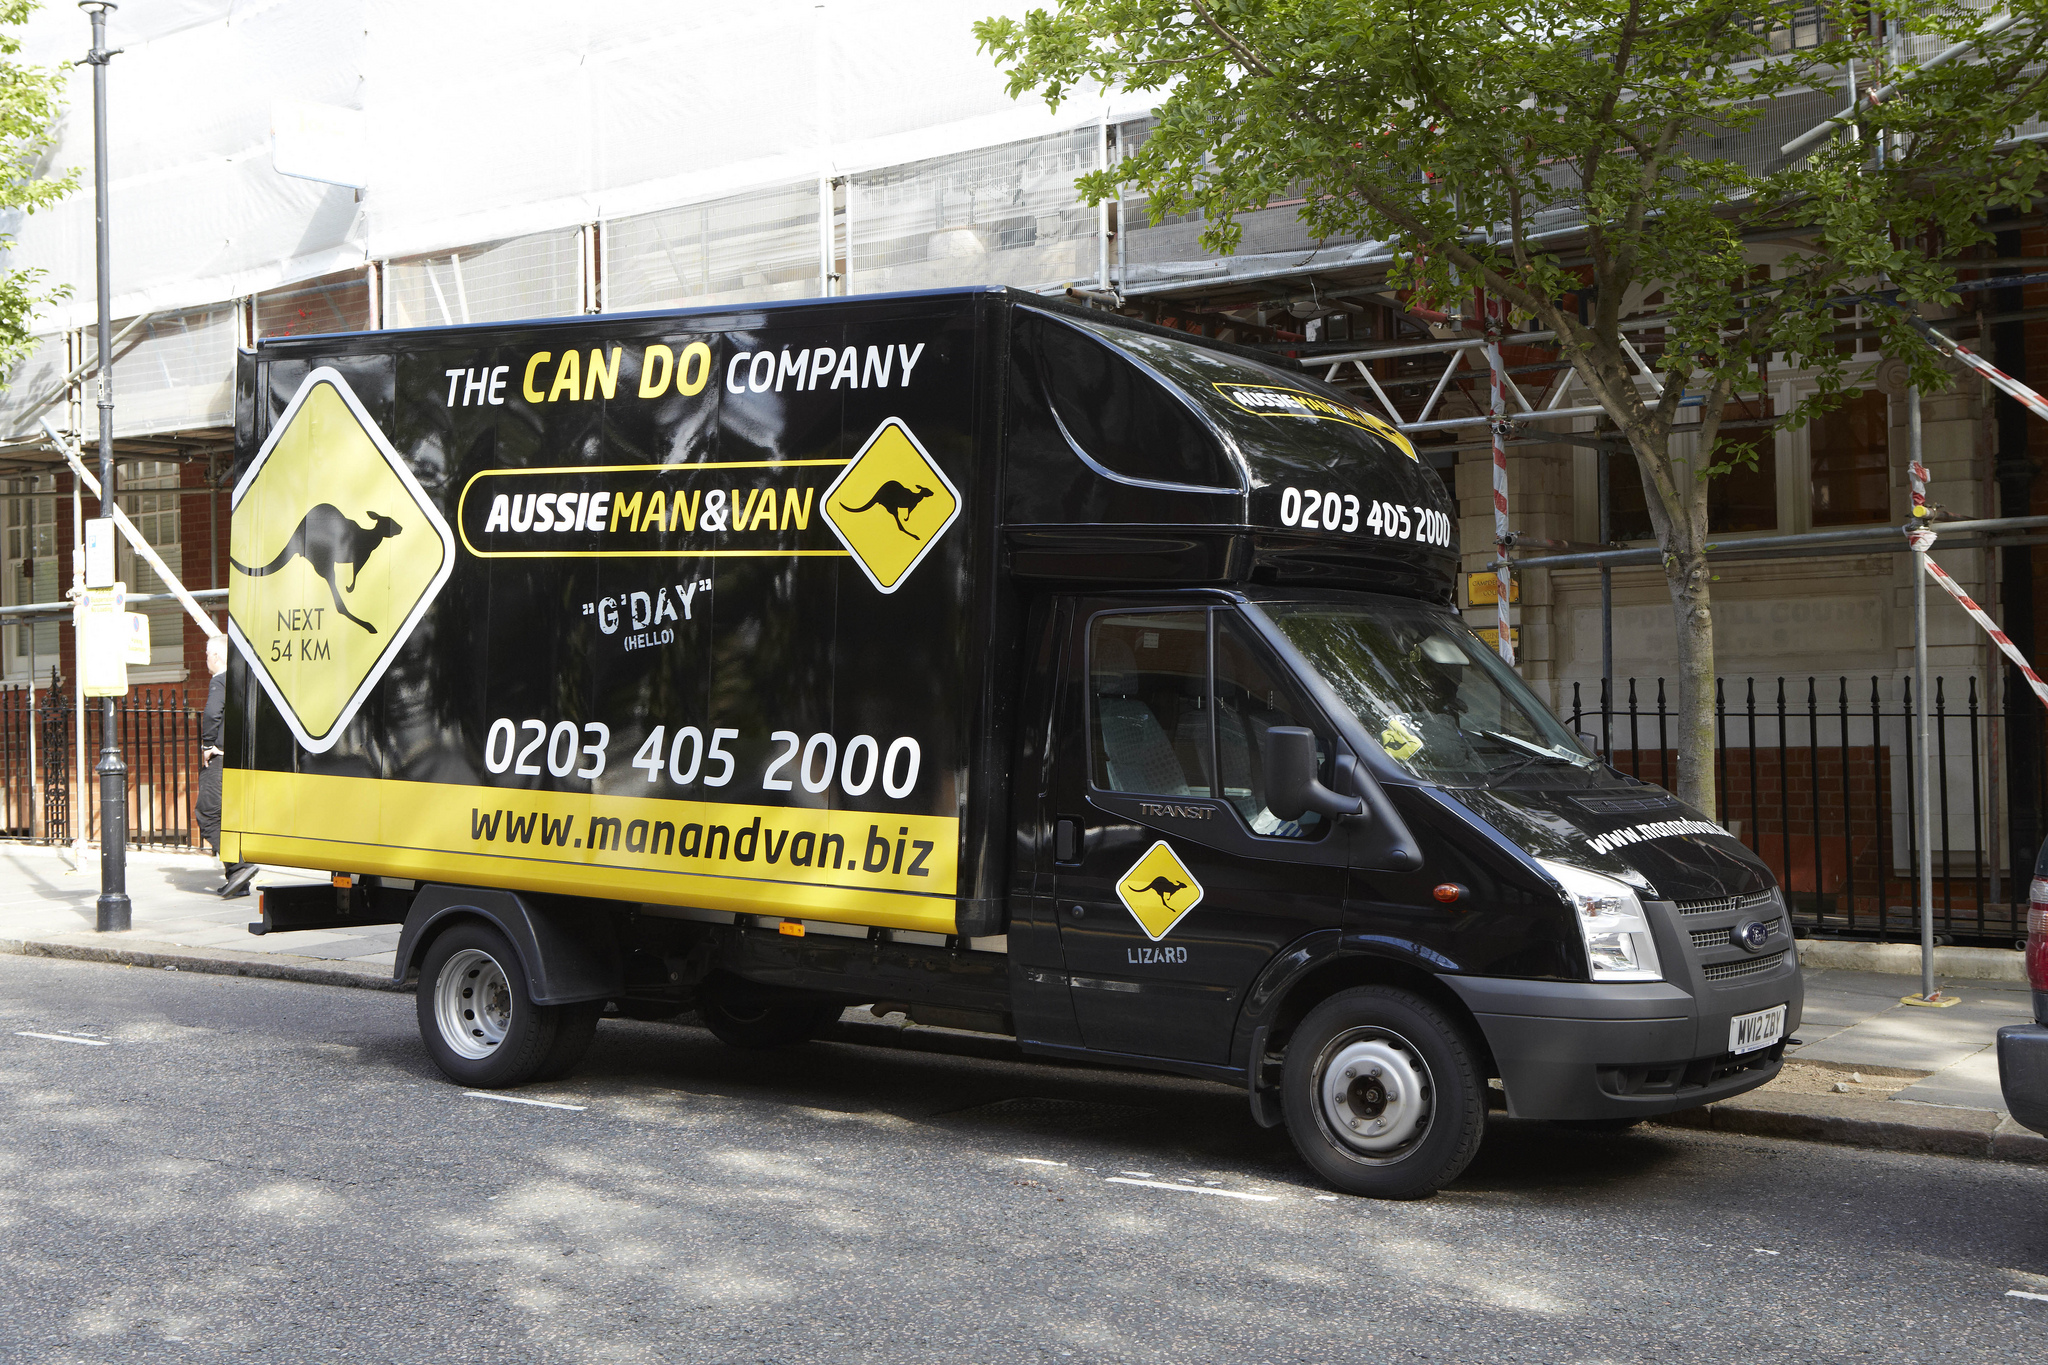 Aussie Man & Van Vehicle Graphics